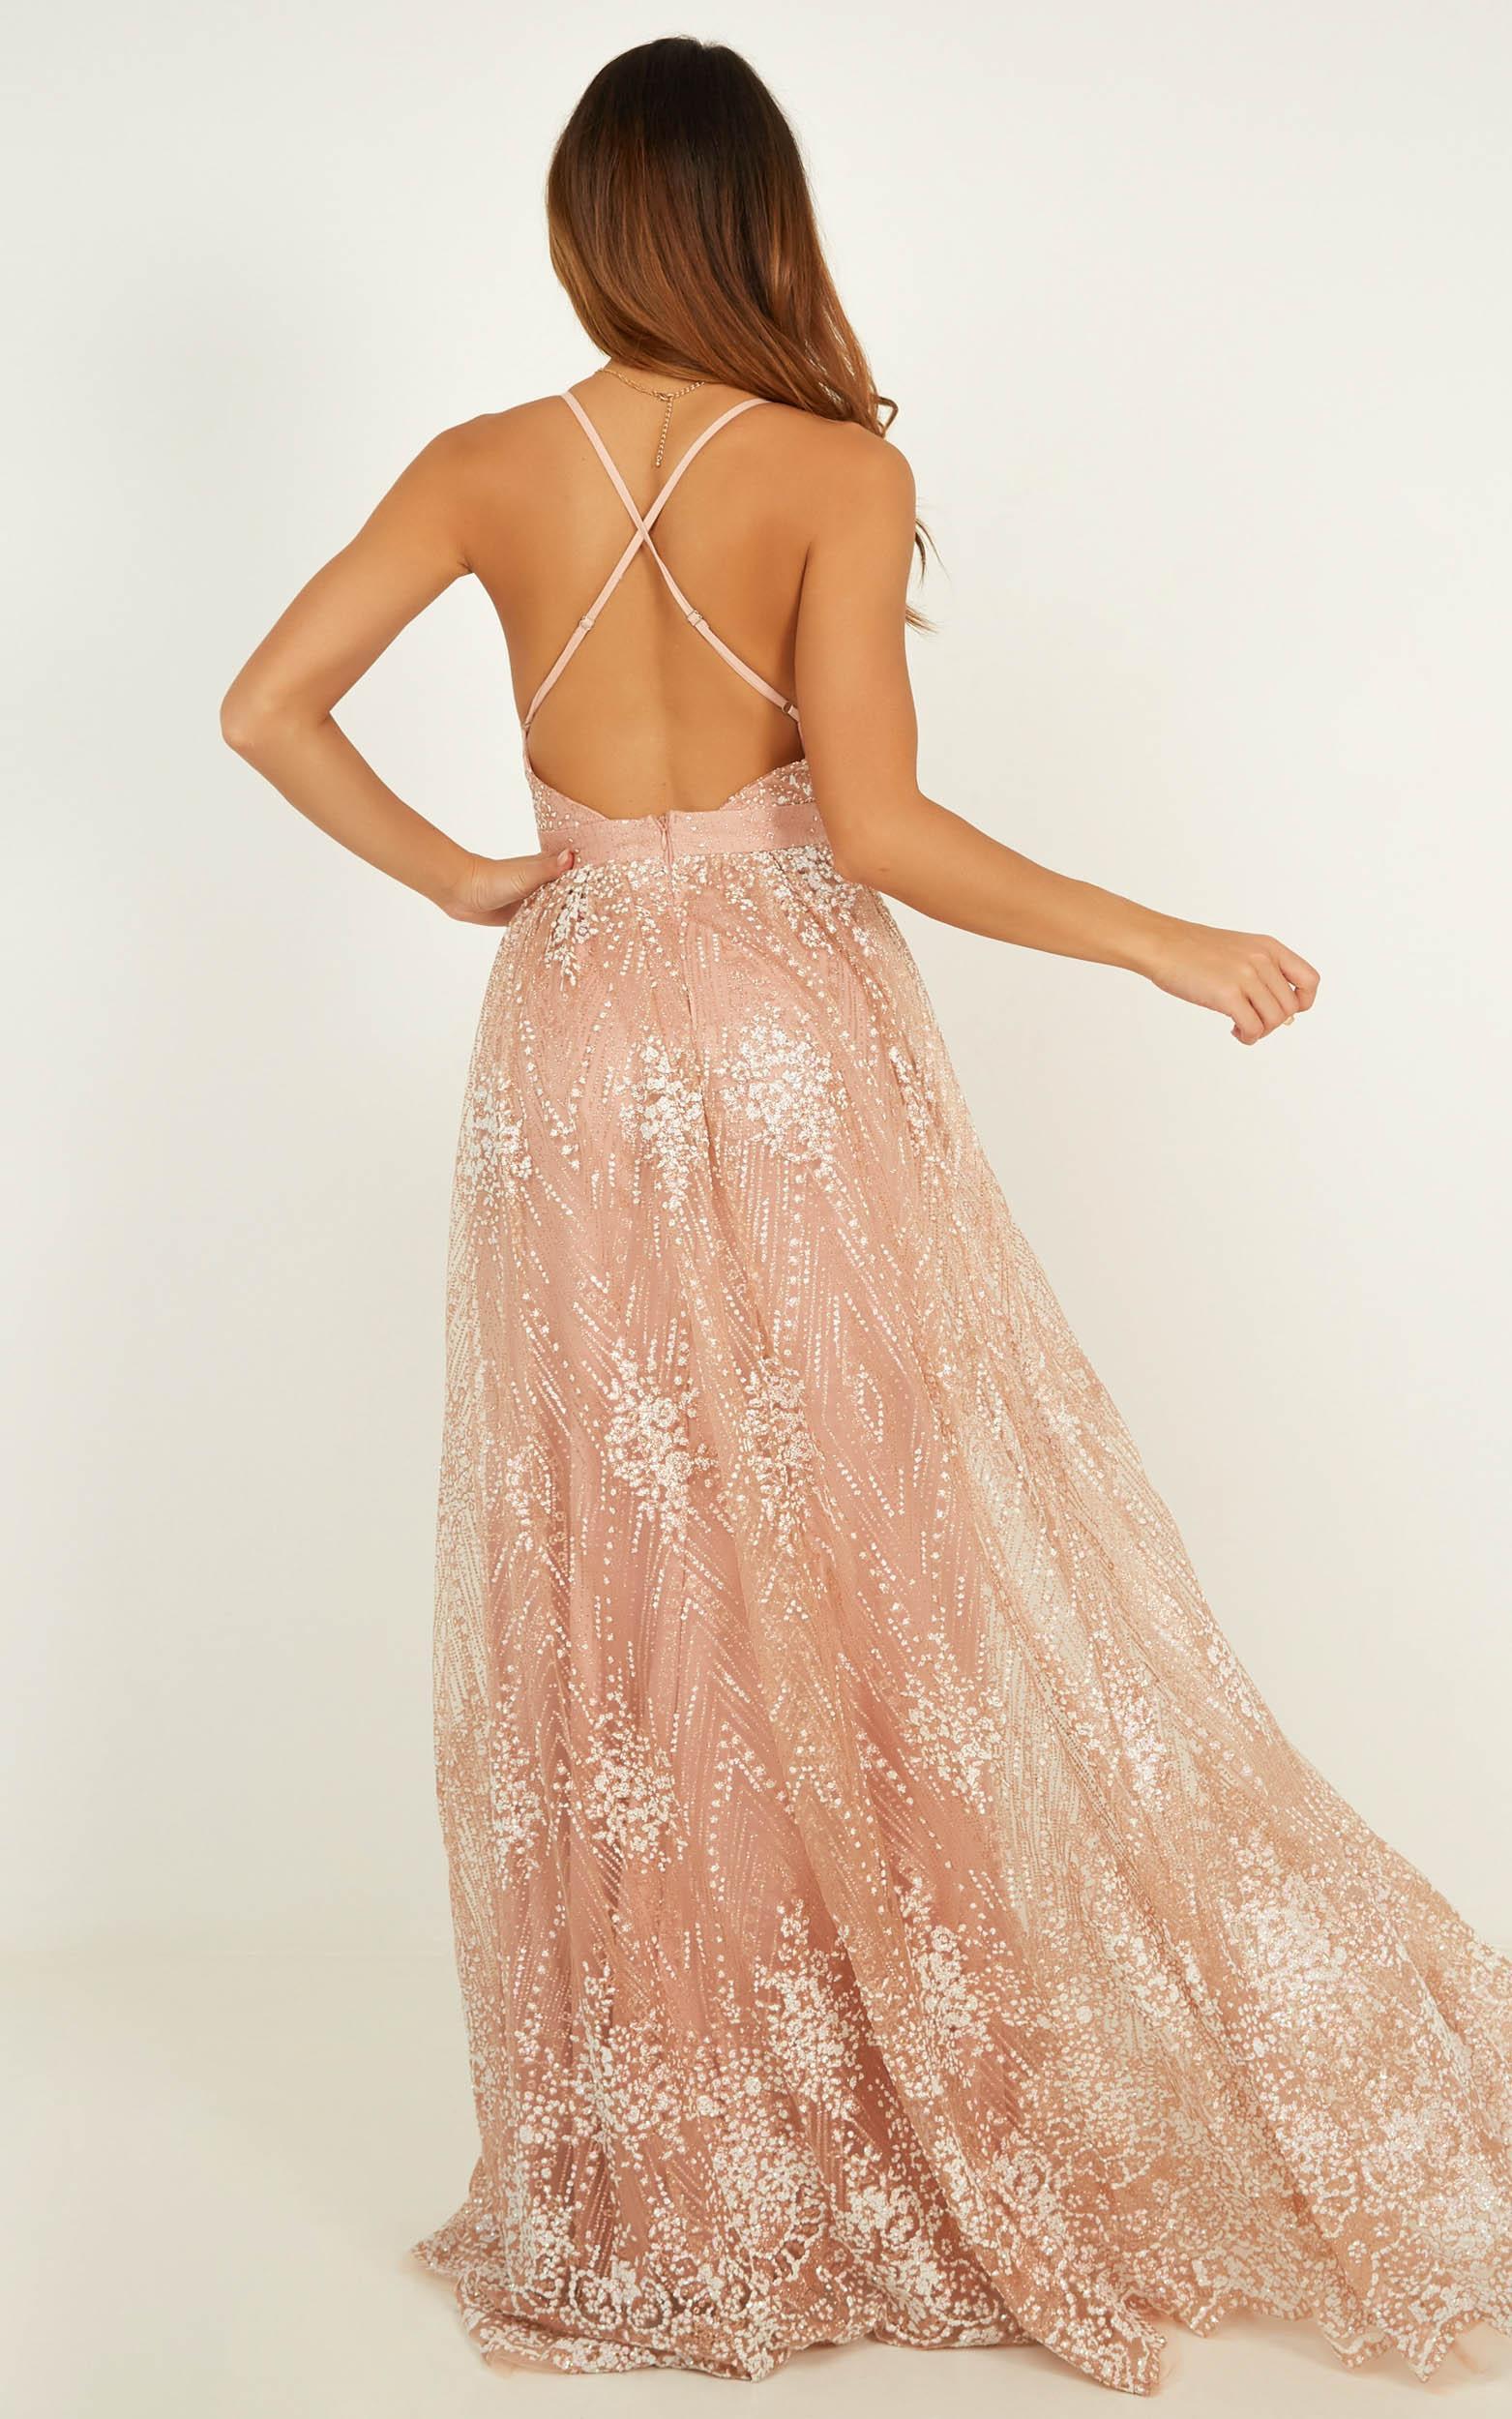 Her Crystal Eyes maxi dress in rose gold glitter - 12 (L), Rose Gold, hi-res image number null